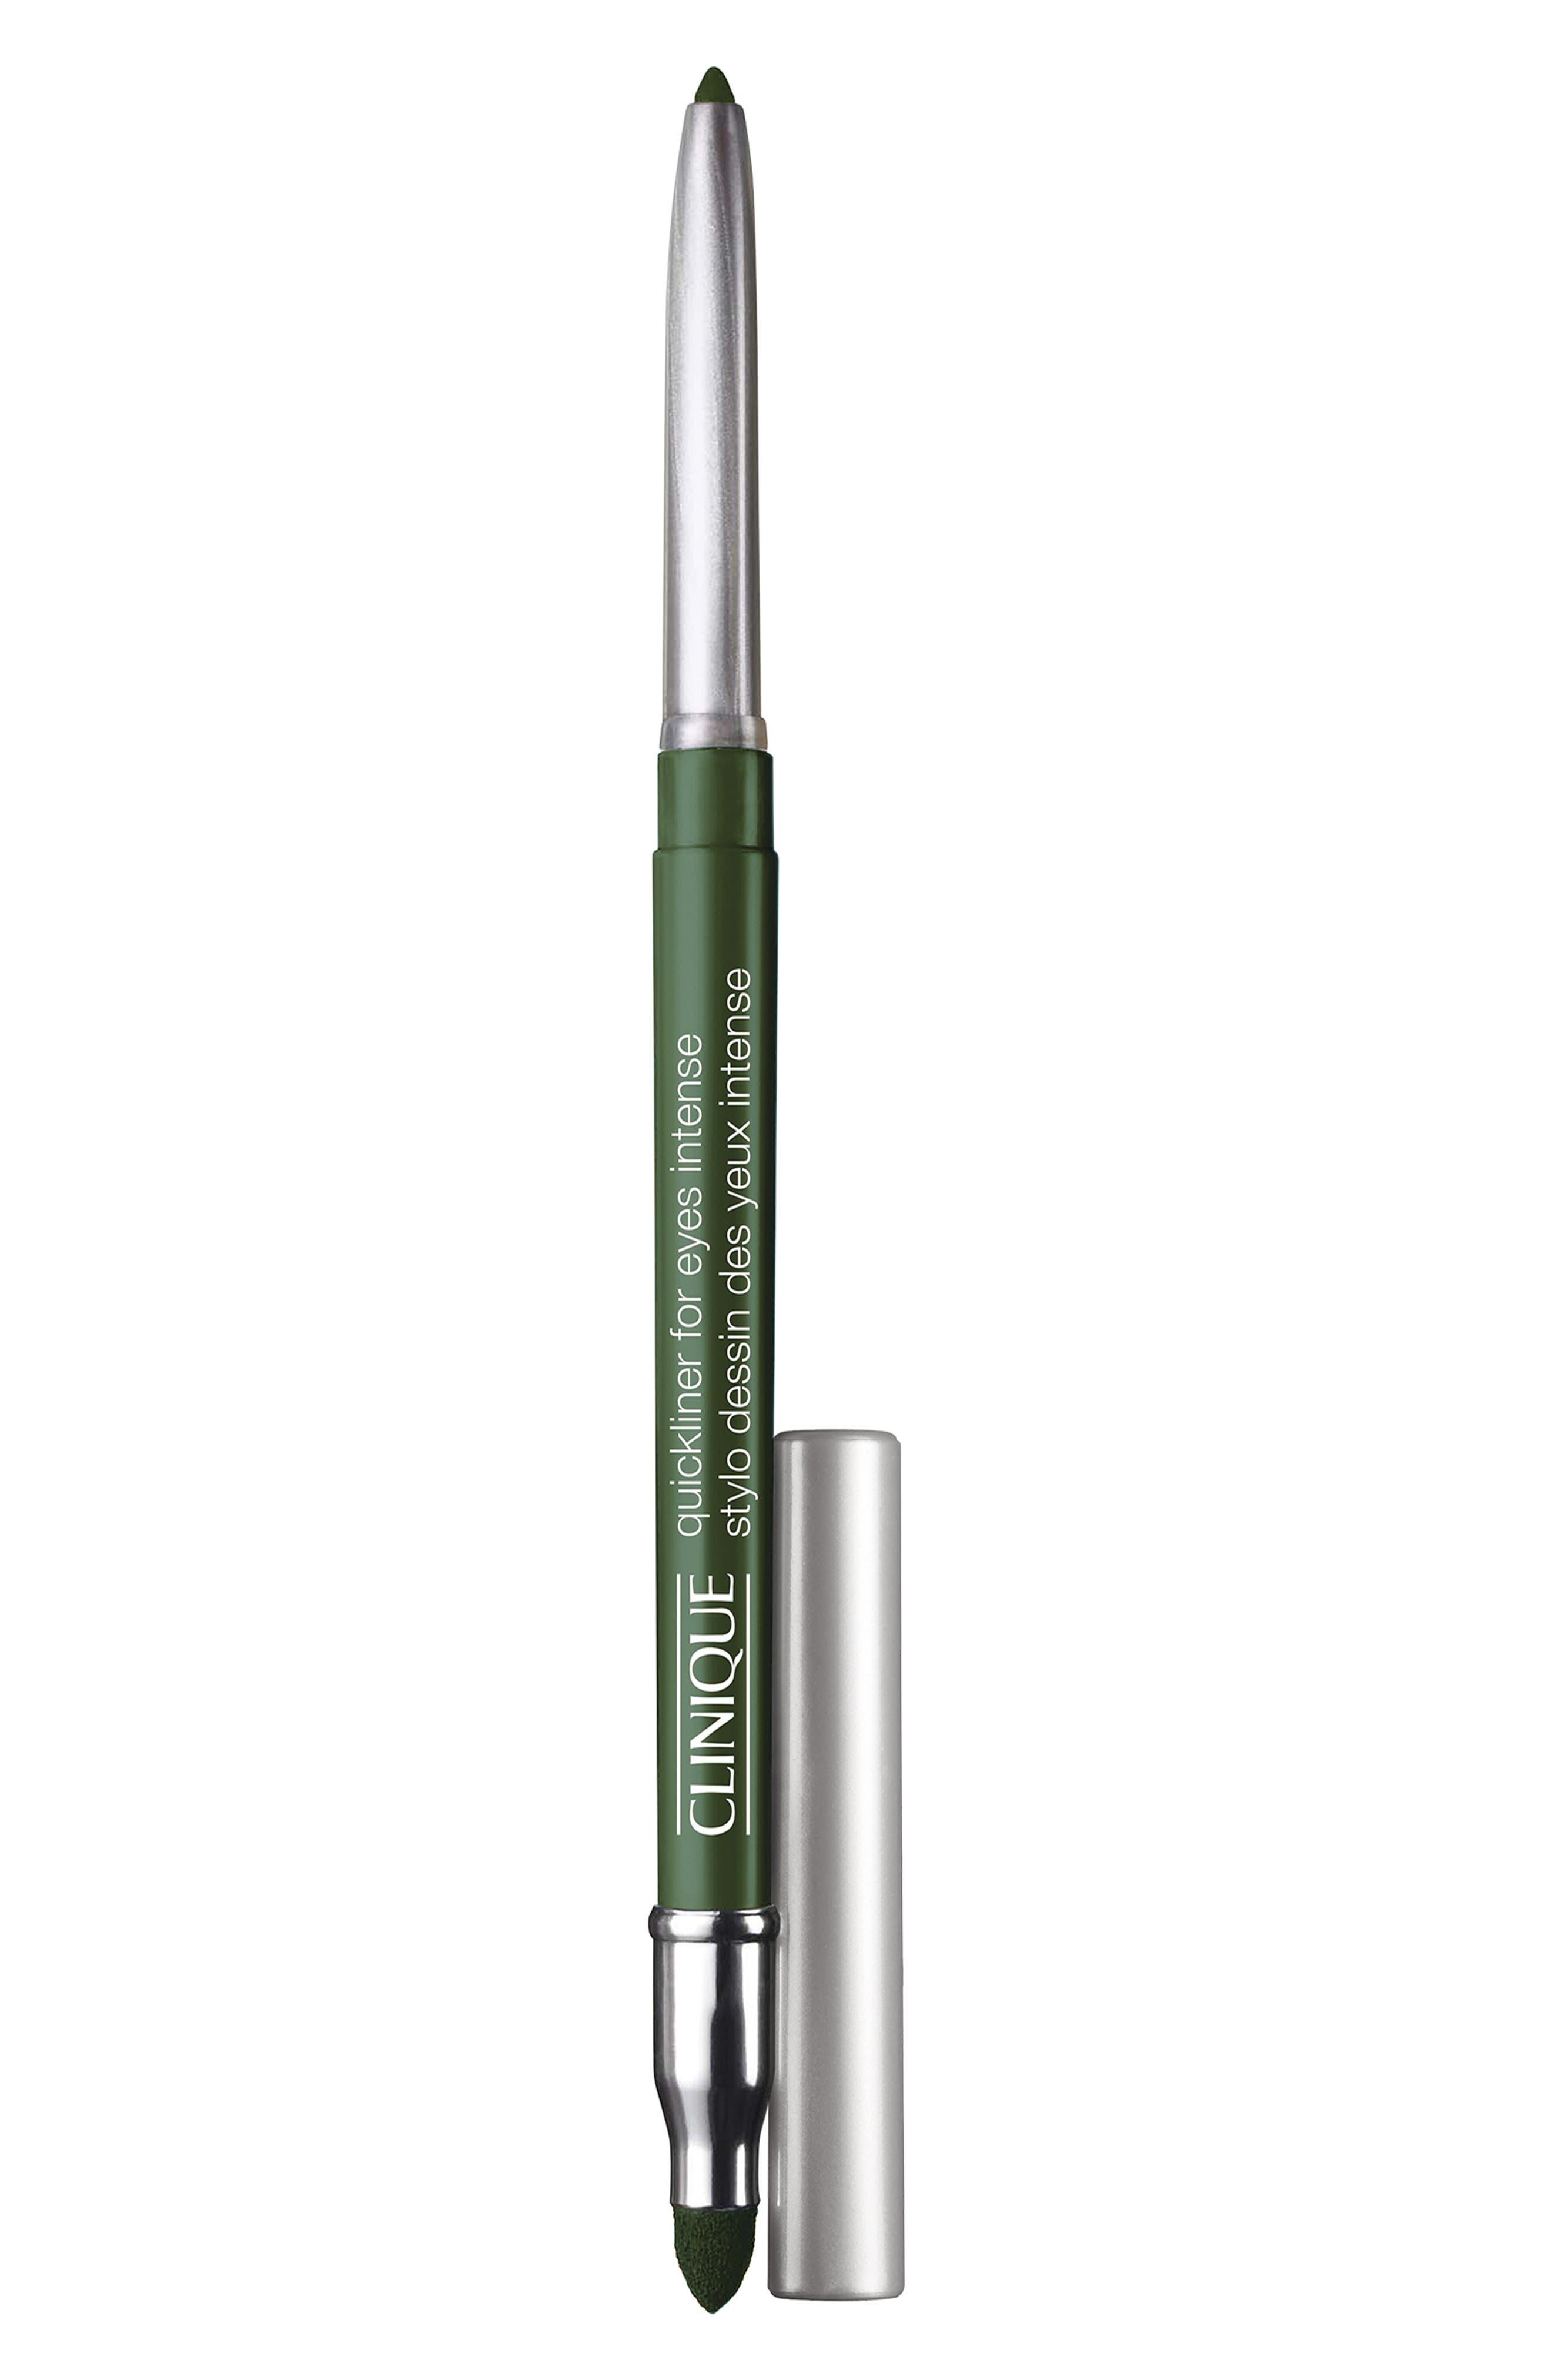 Clinique Quickliner For Eyes Intense Eyeliner Pencil - Intense Ivy